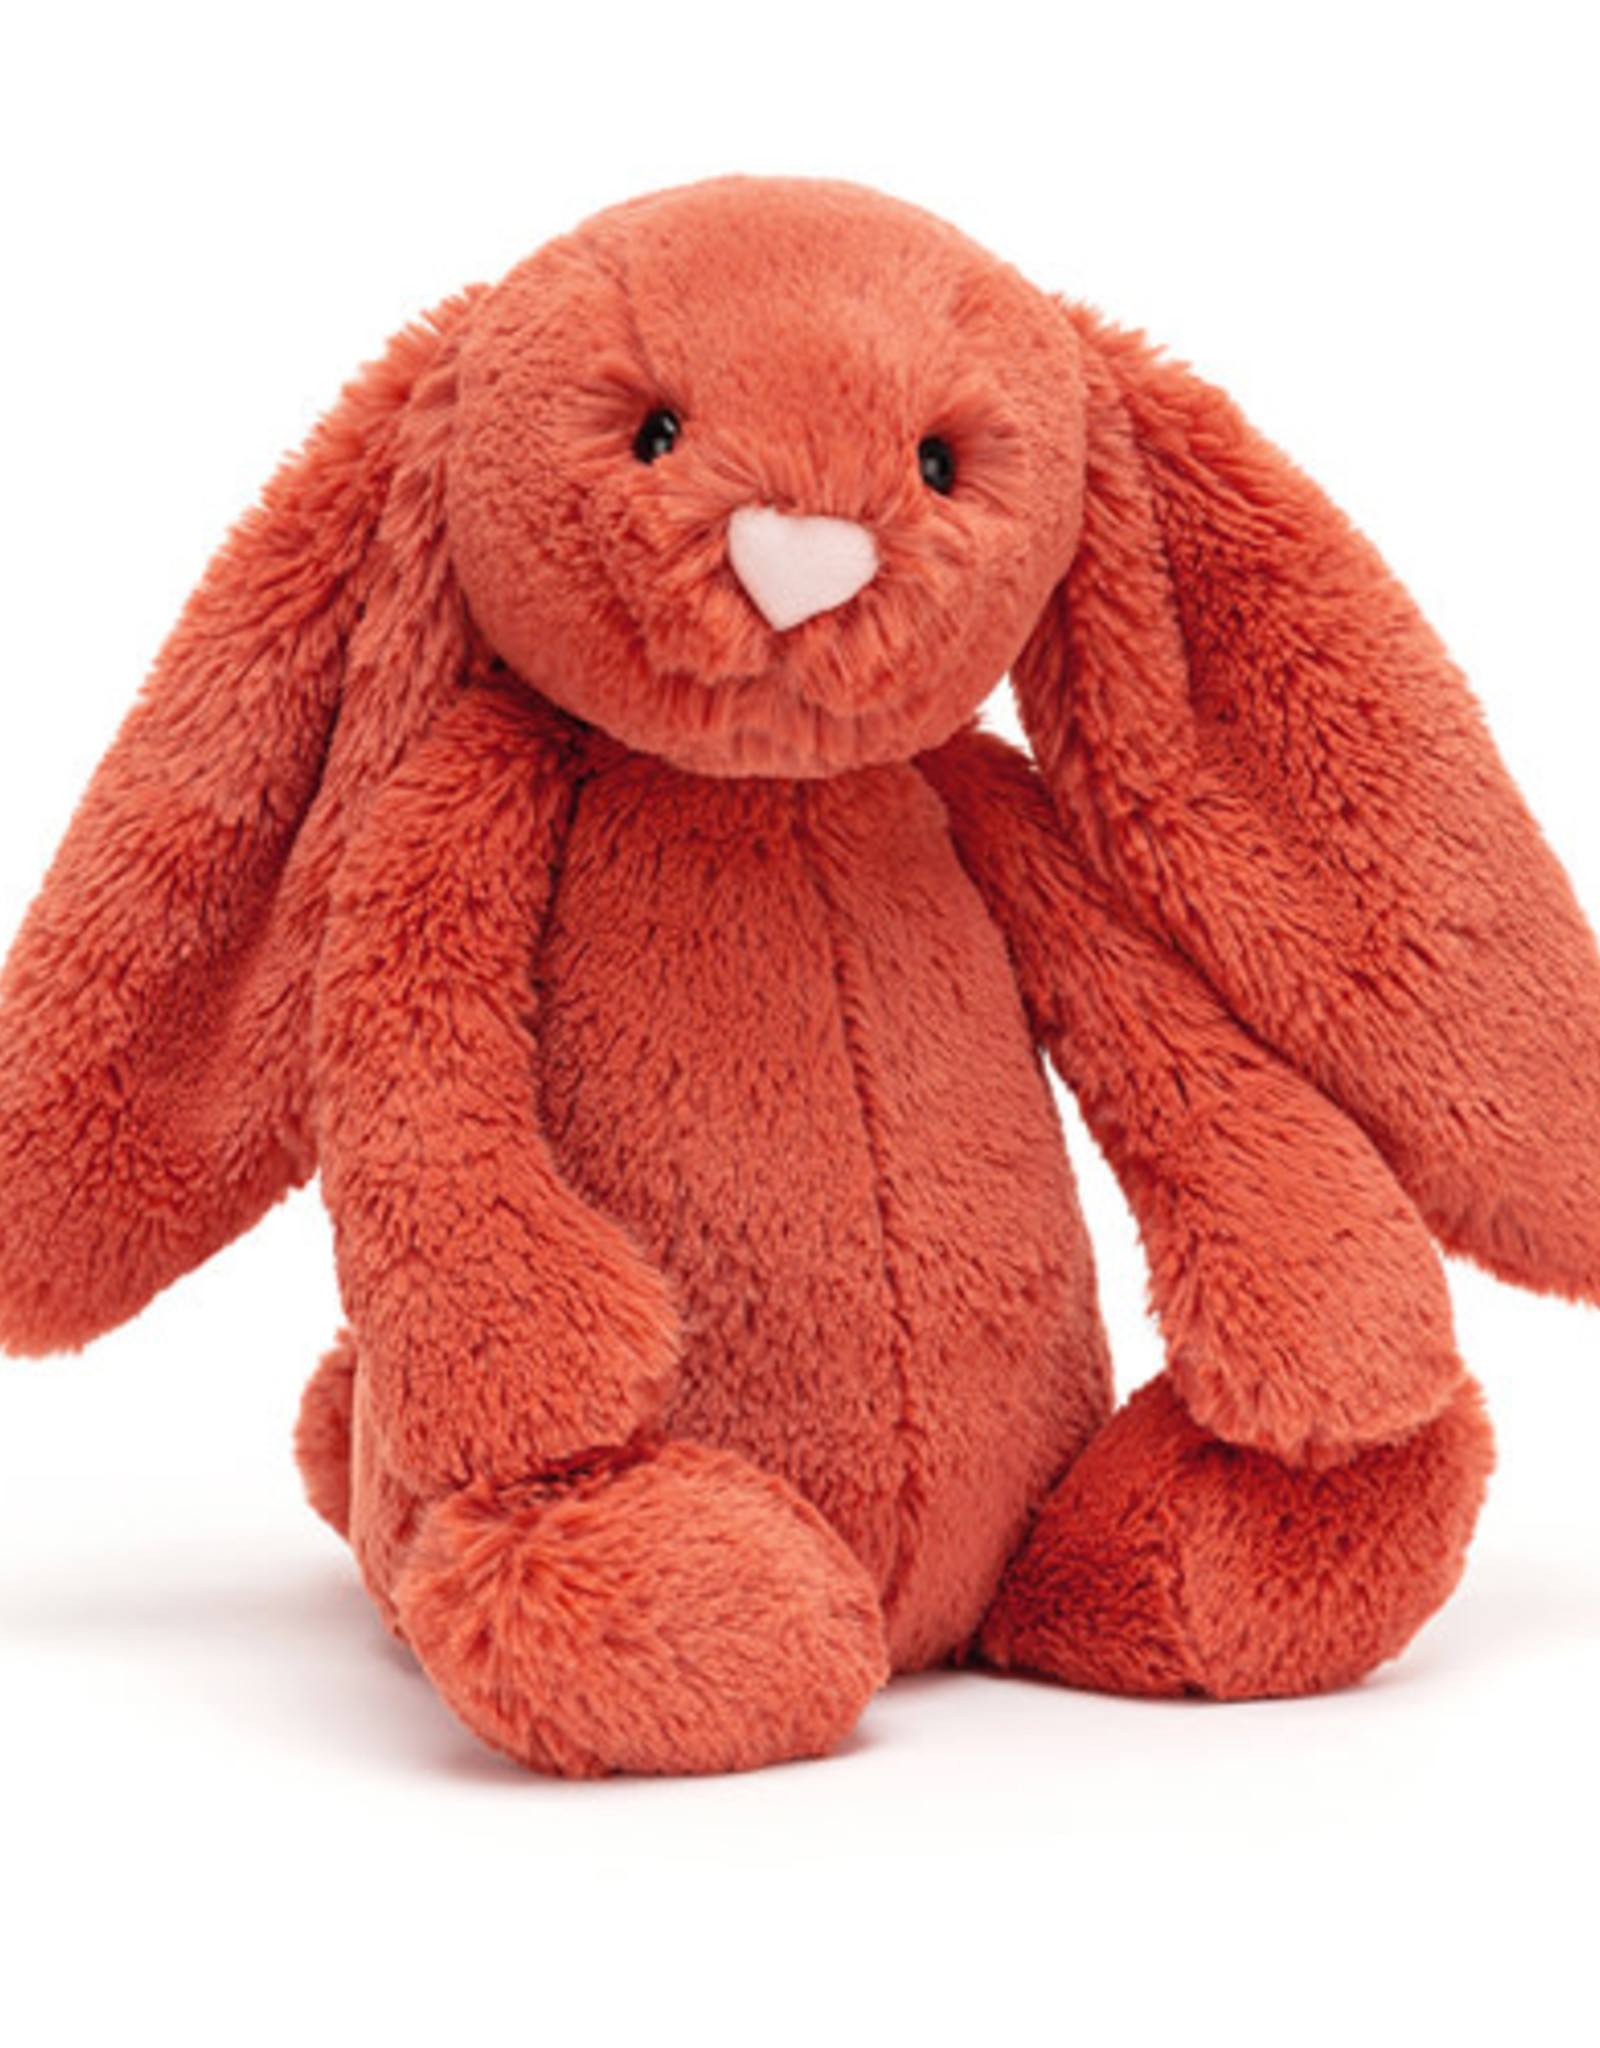 Jellycat Bashful Bunny Cinnamon M